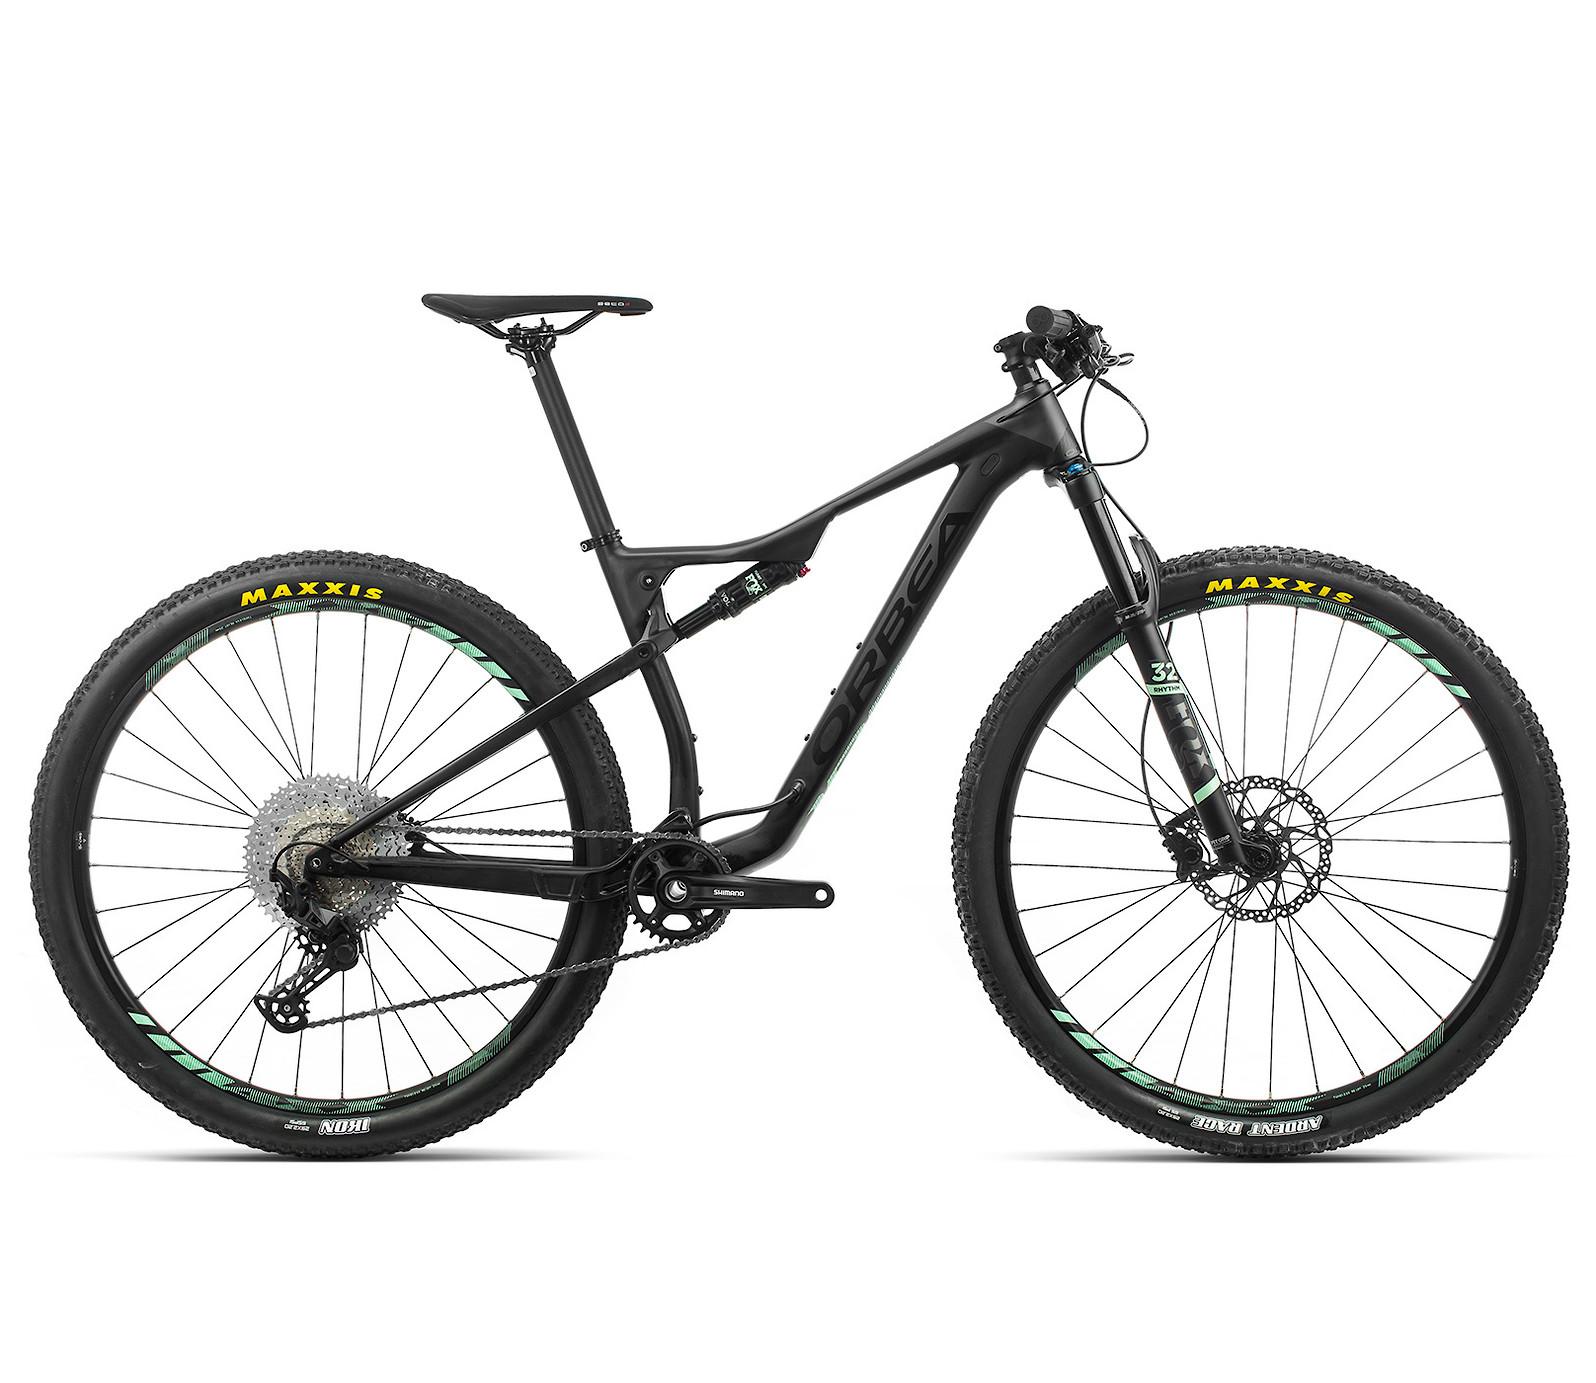 2020 Orbea Oiz H30 in black-graphite/black